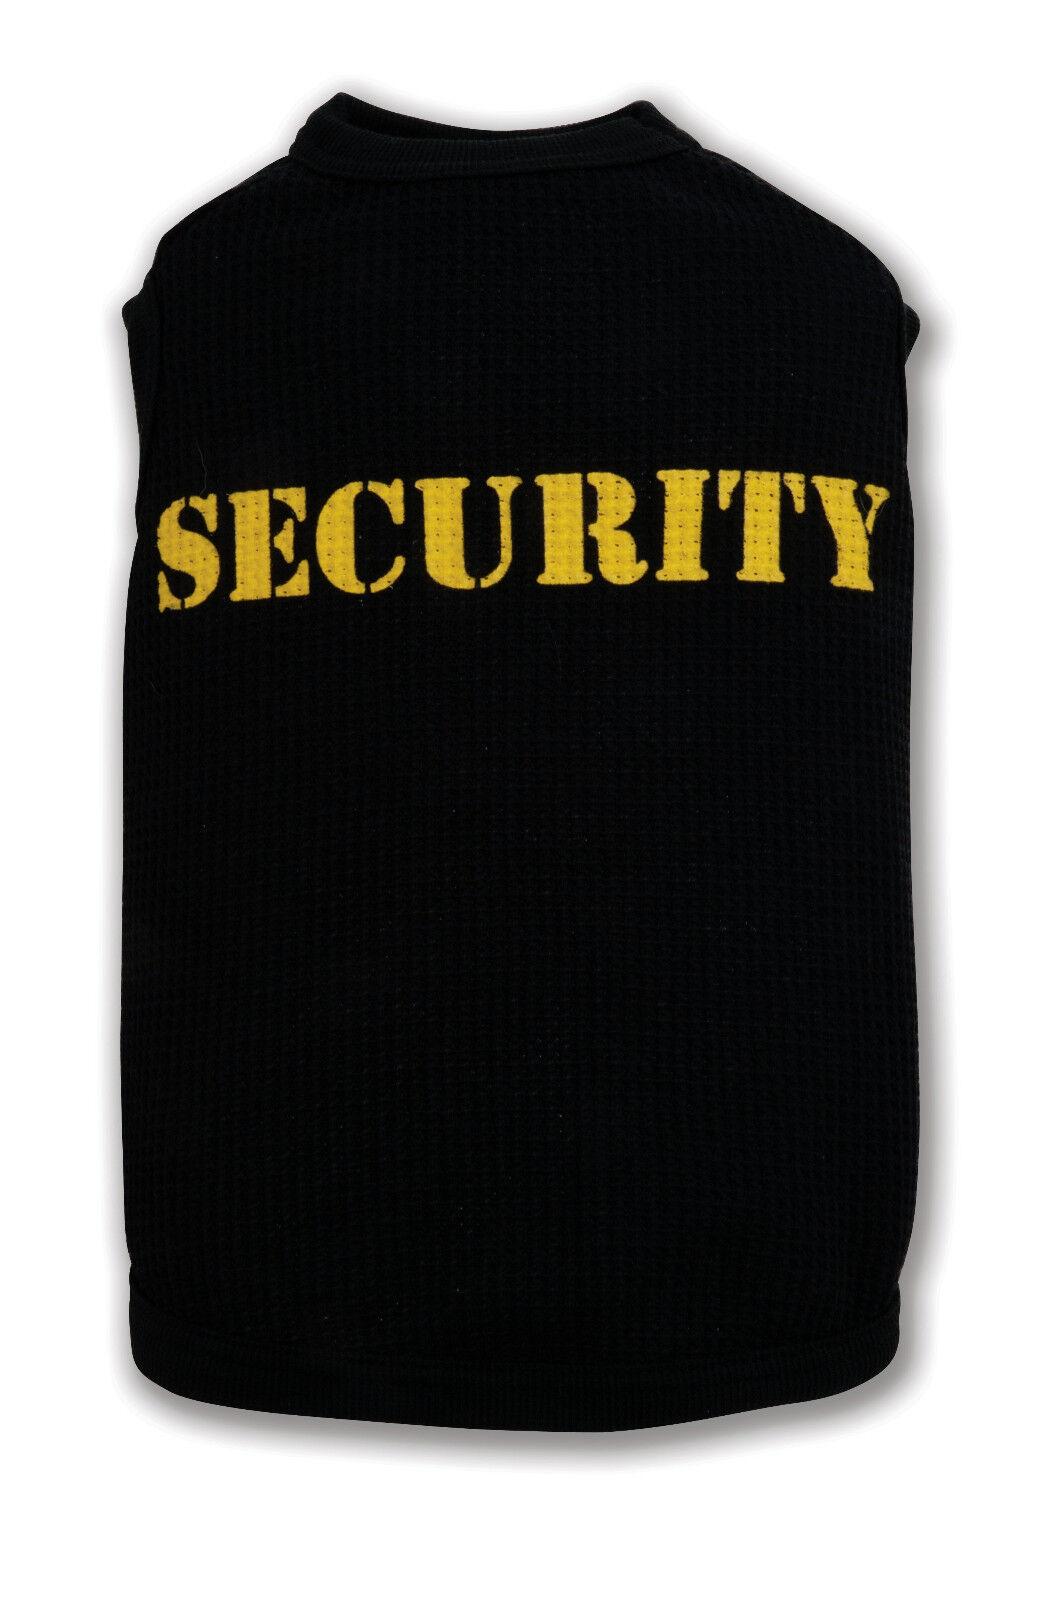 Cold Woof Dog Thermals XS 3xl Camo Tye Dye Pet T shirts Security